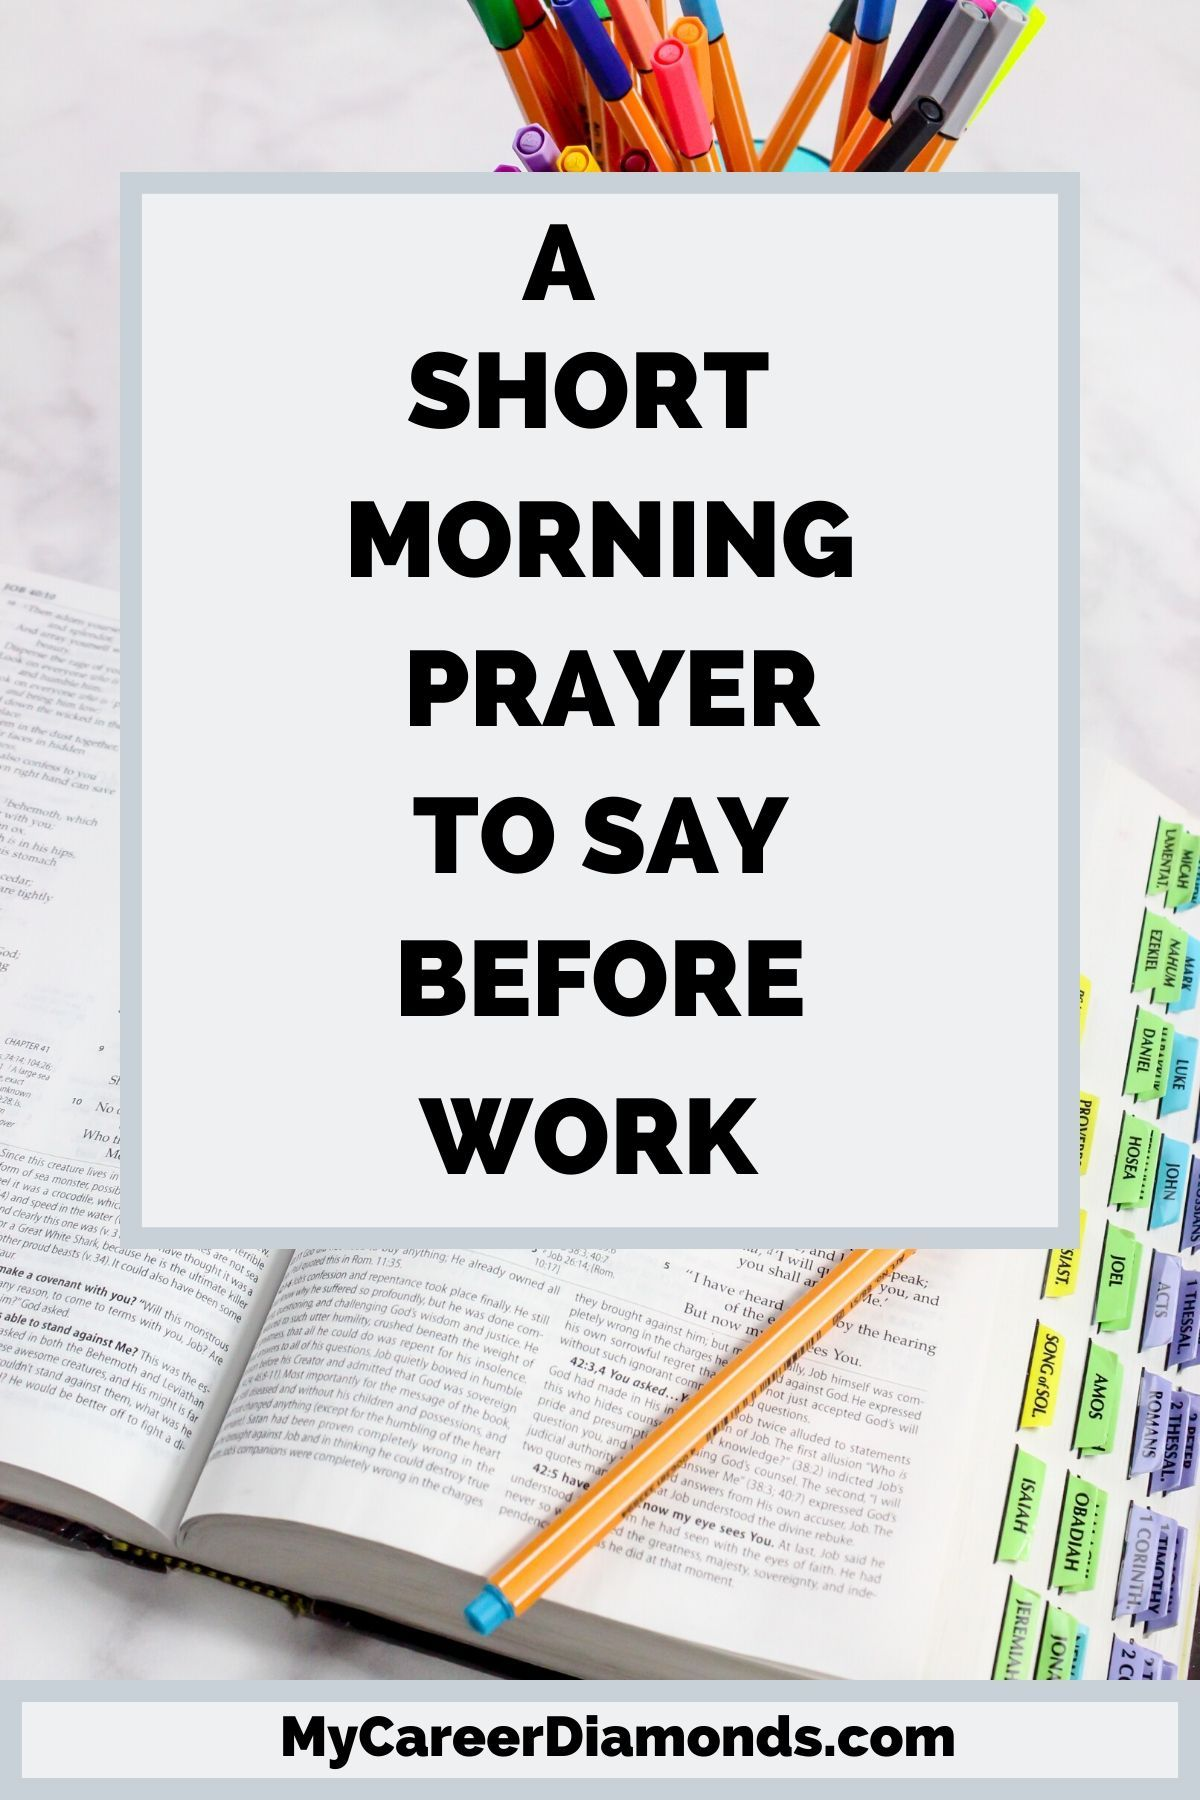 A Short Morning Prayer to Say Before Work Short prayers